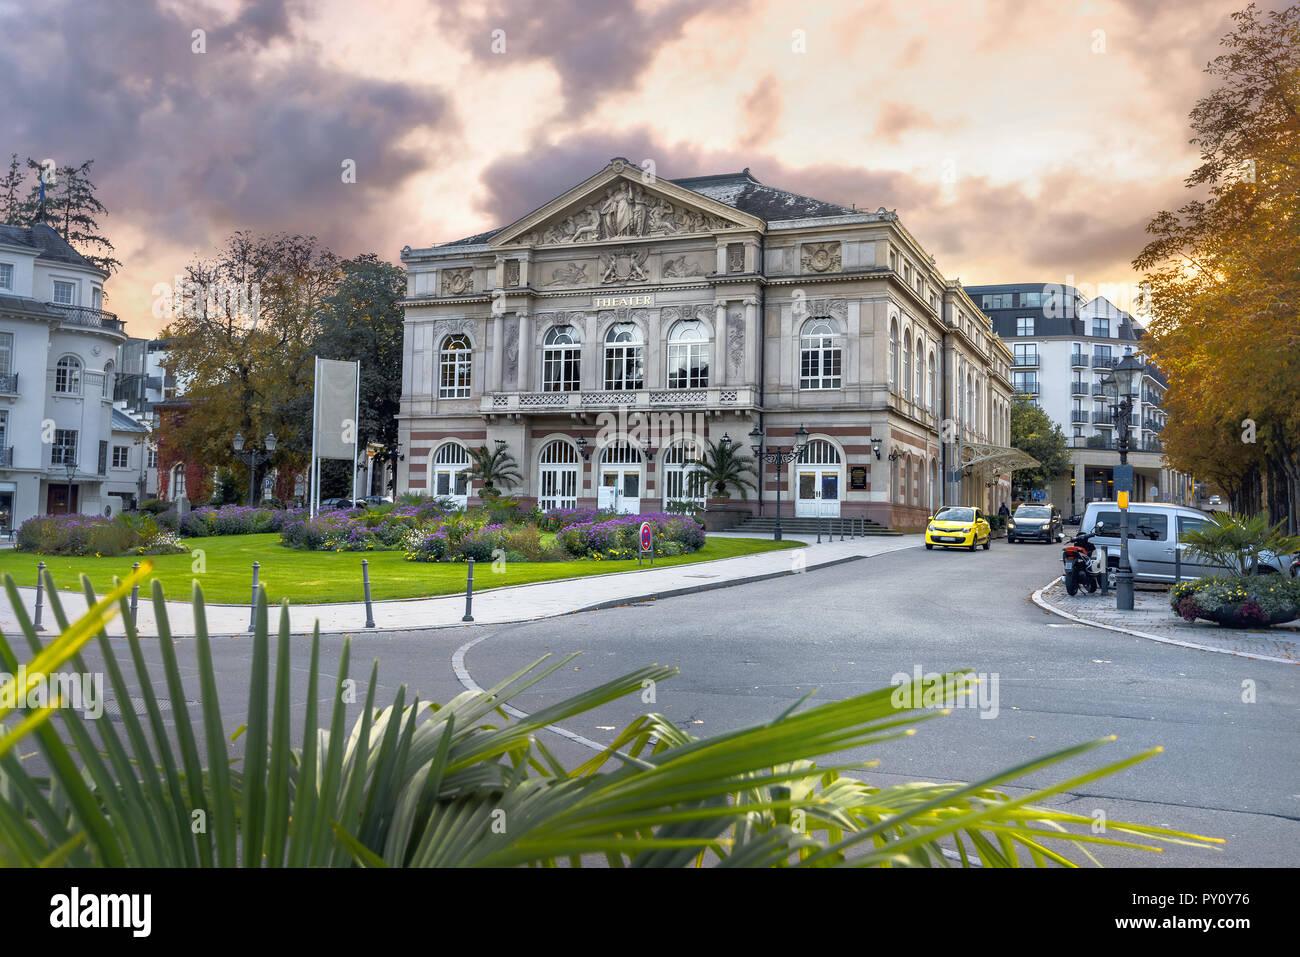 Famous theater at Goetheplatz square in Baden-Baden, Germany - Stock Image